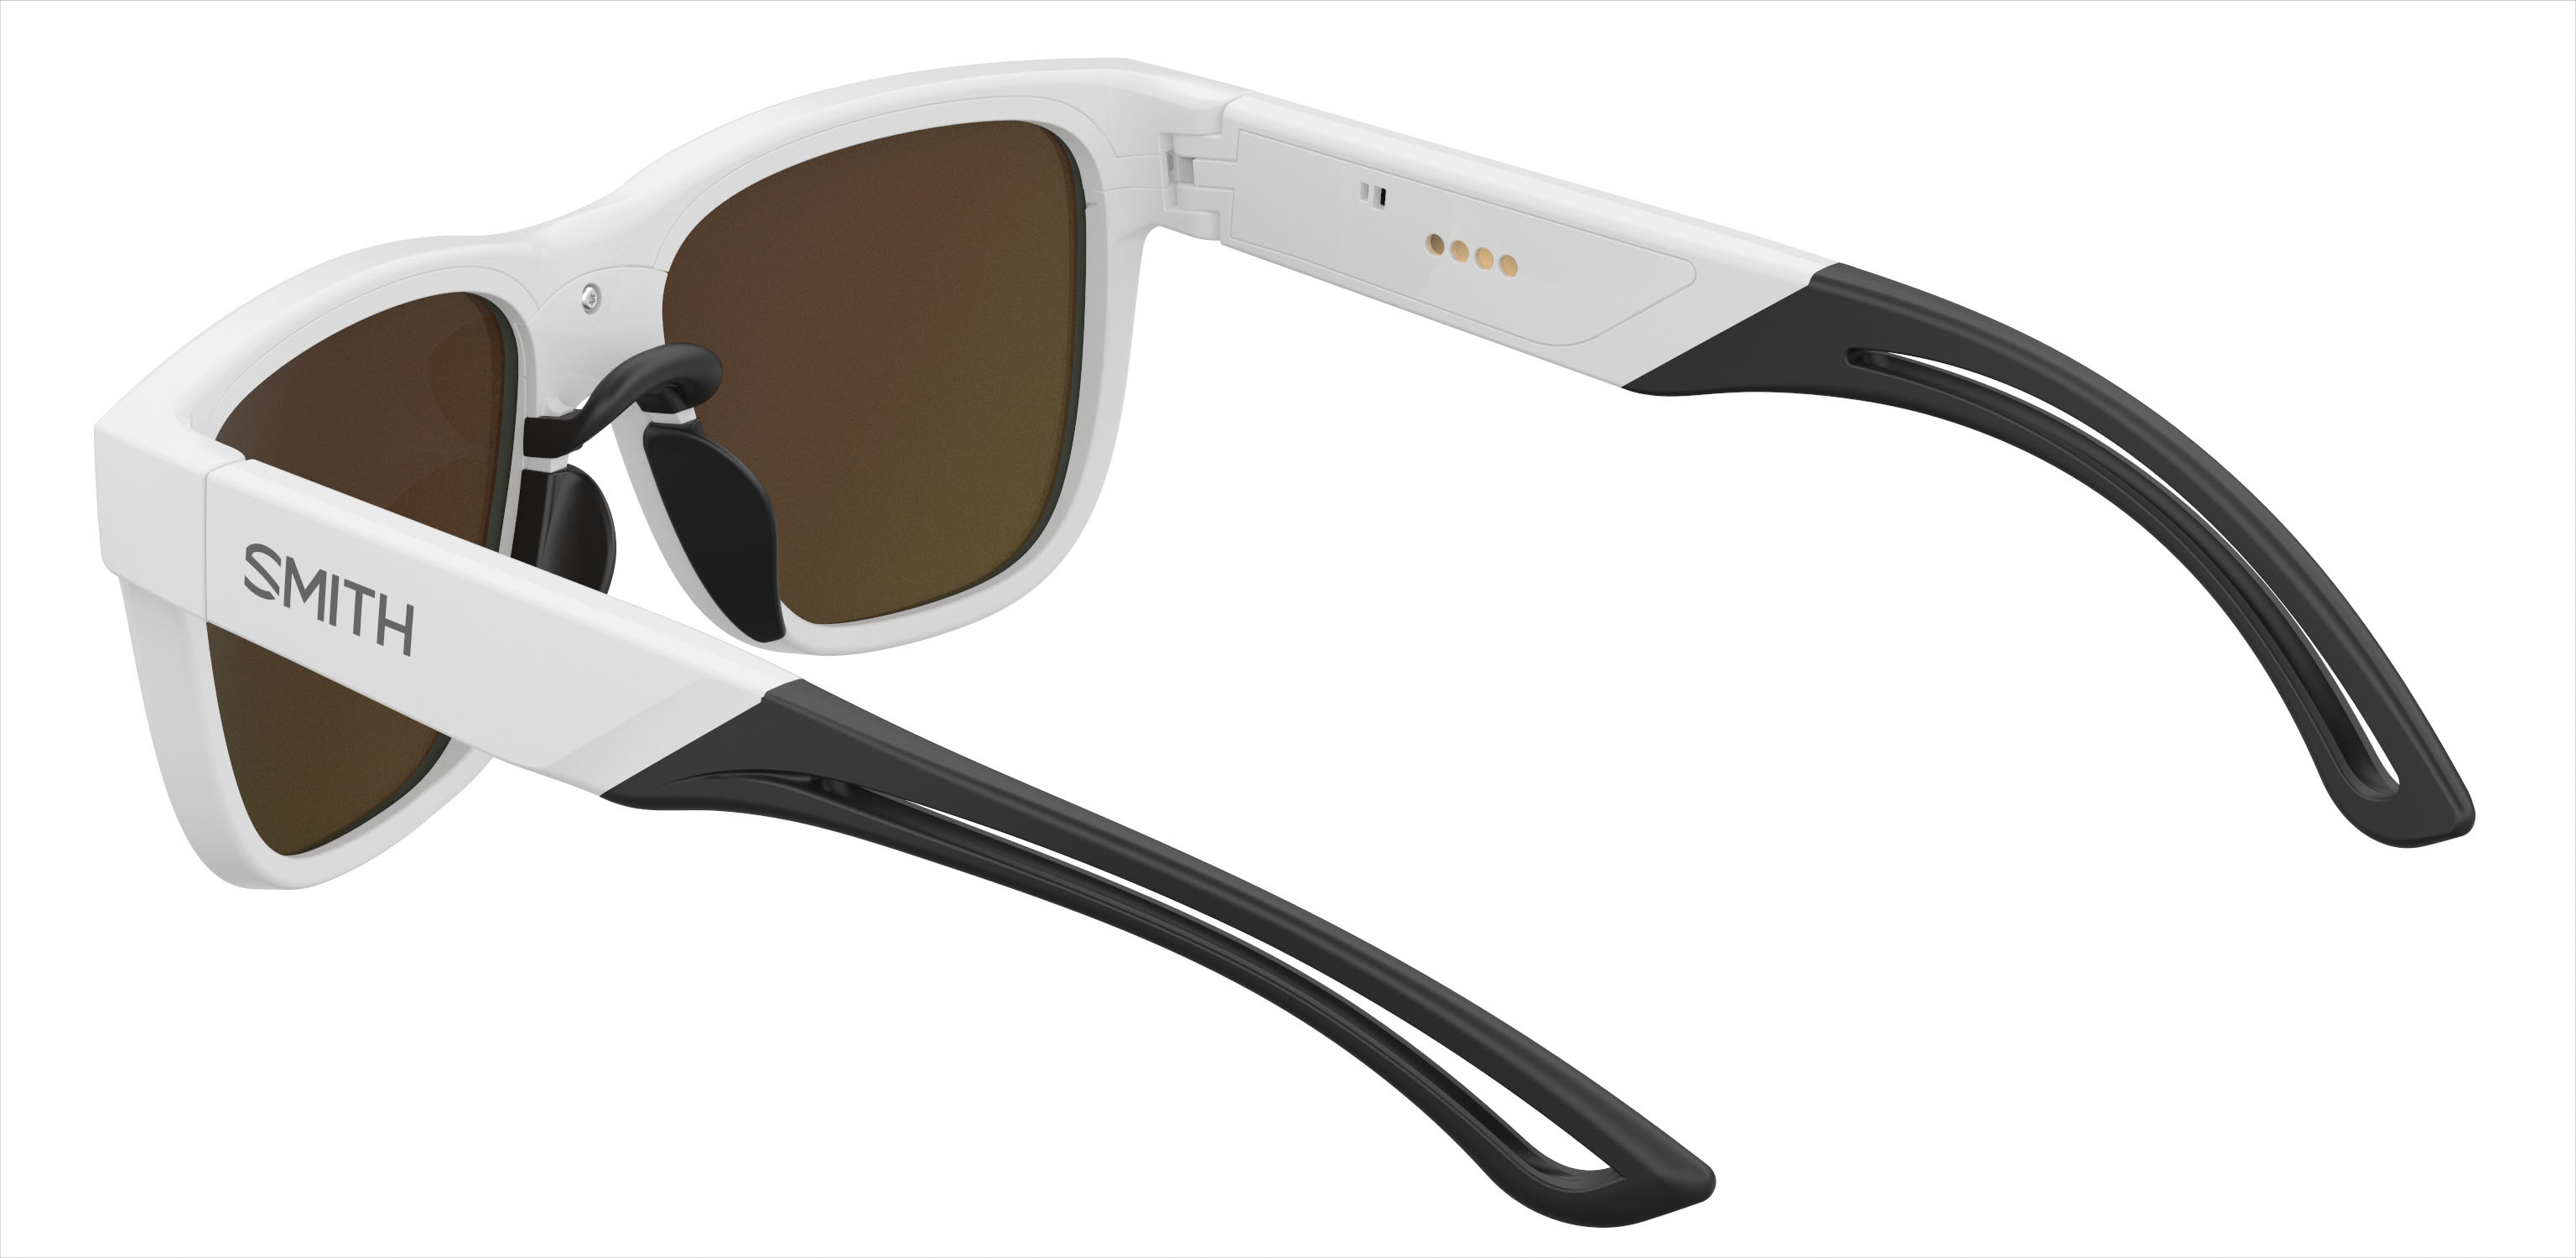 9b85e66682 Zen Zone  Brain-Sensing Eyewear Aims To Focus The Mind